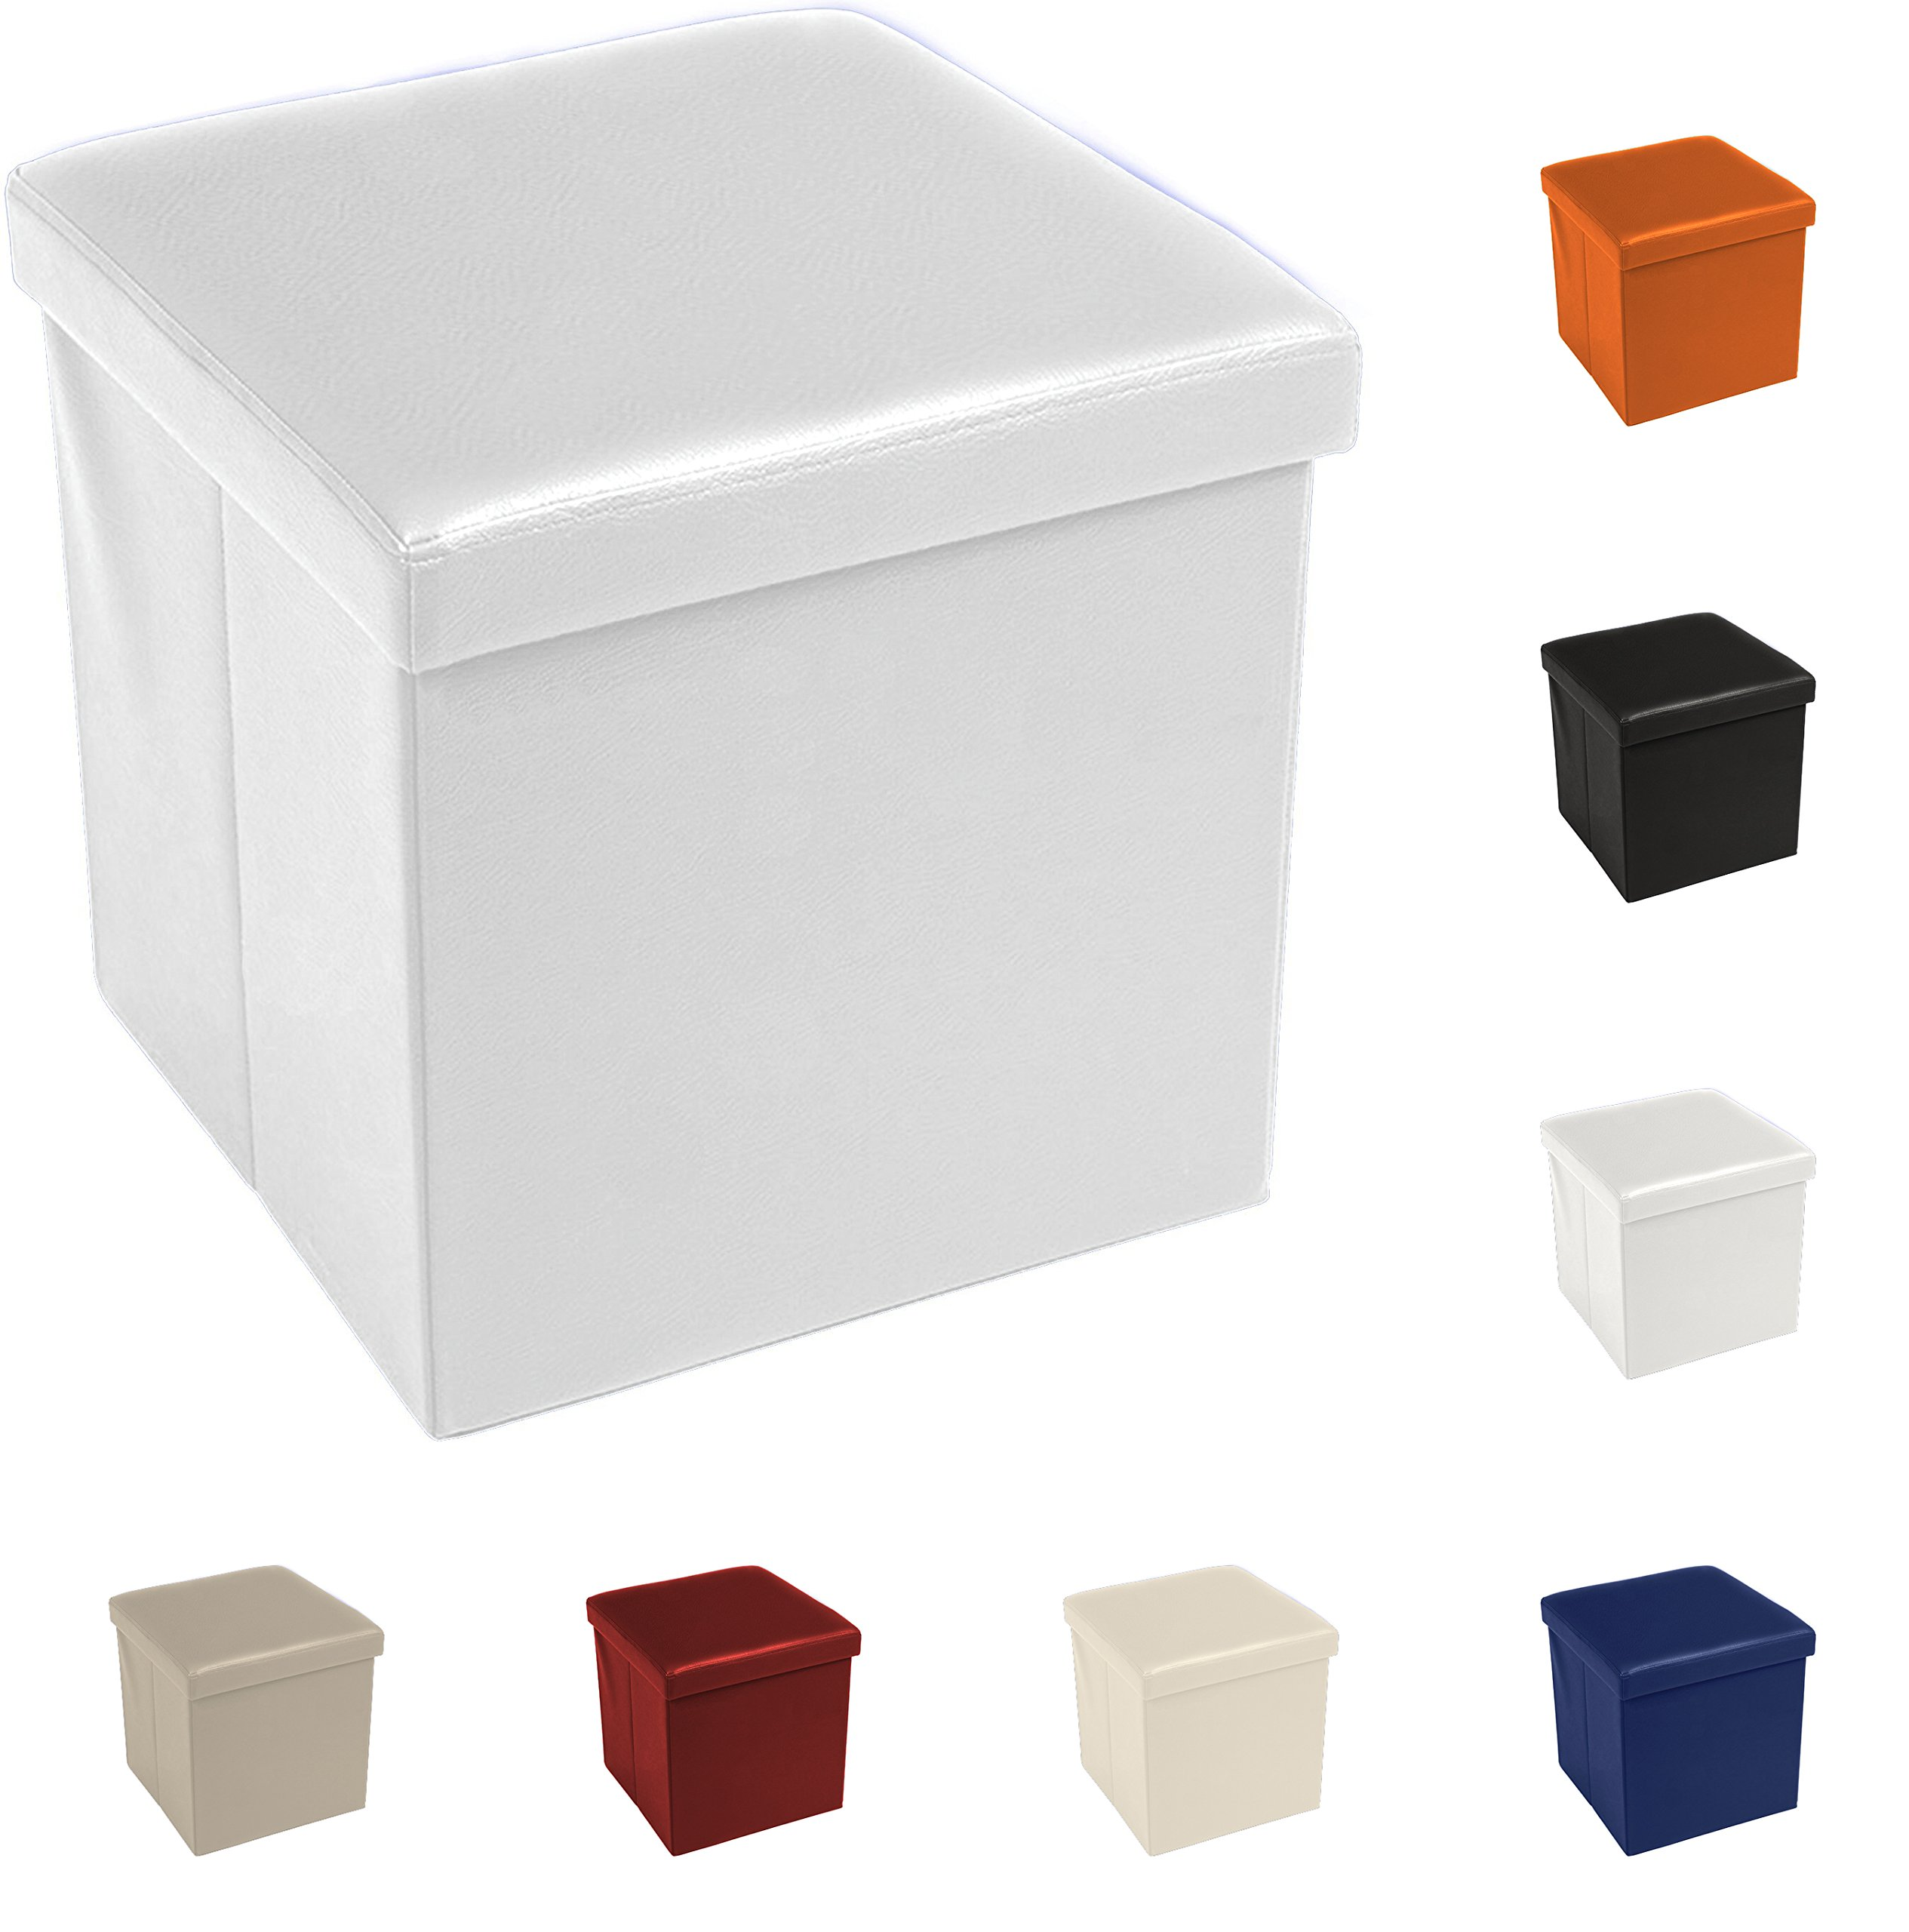 Tata Home Puf Puff Contenedor Caja Cubo reposapiés Taburete de Piel sintética tamaño 38 x 38 x 38 cm Color Blanco: Amazon.es: Hogar